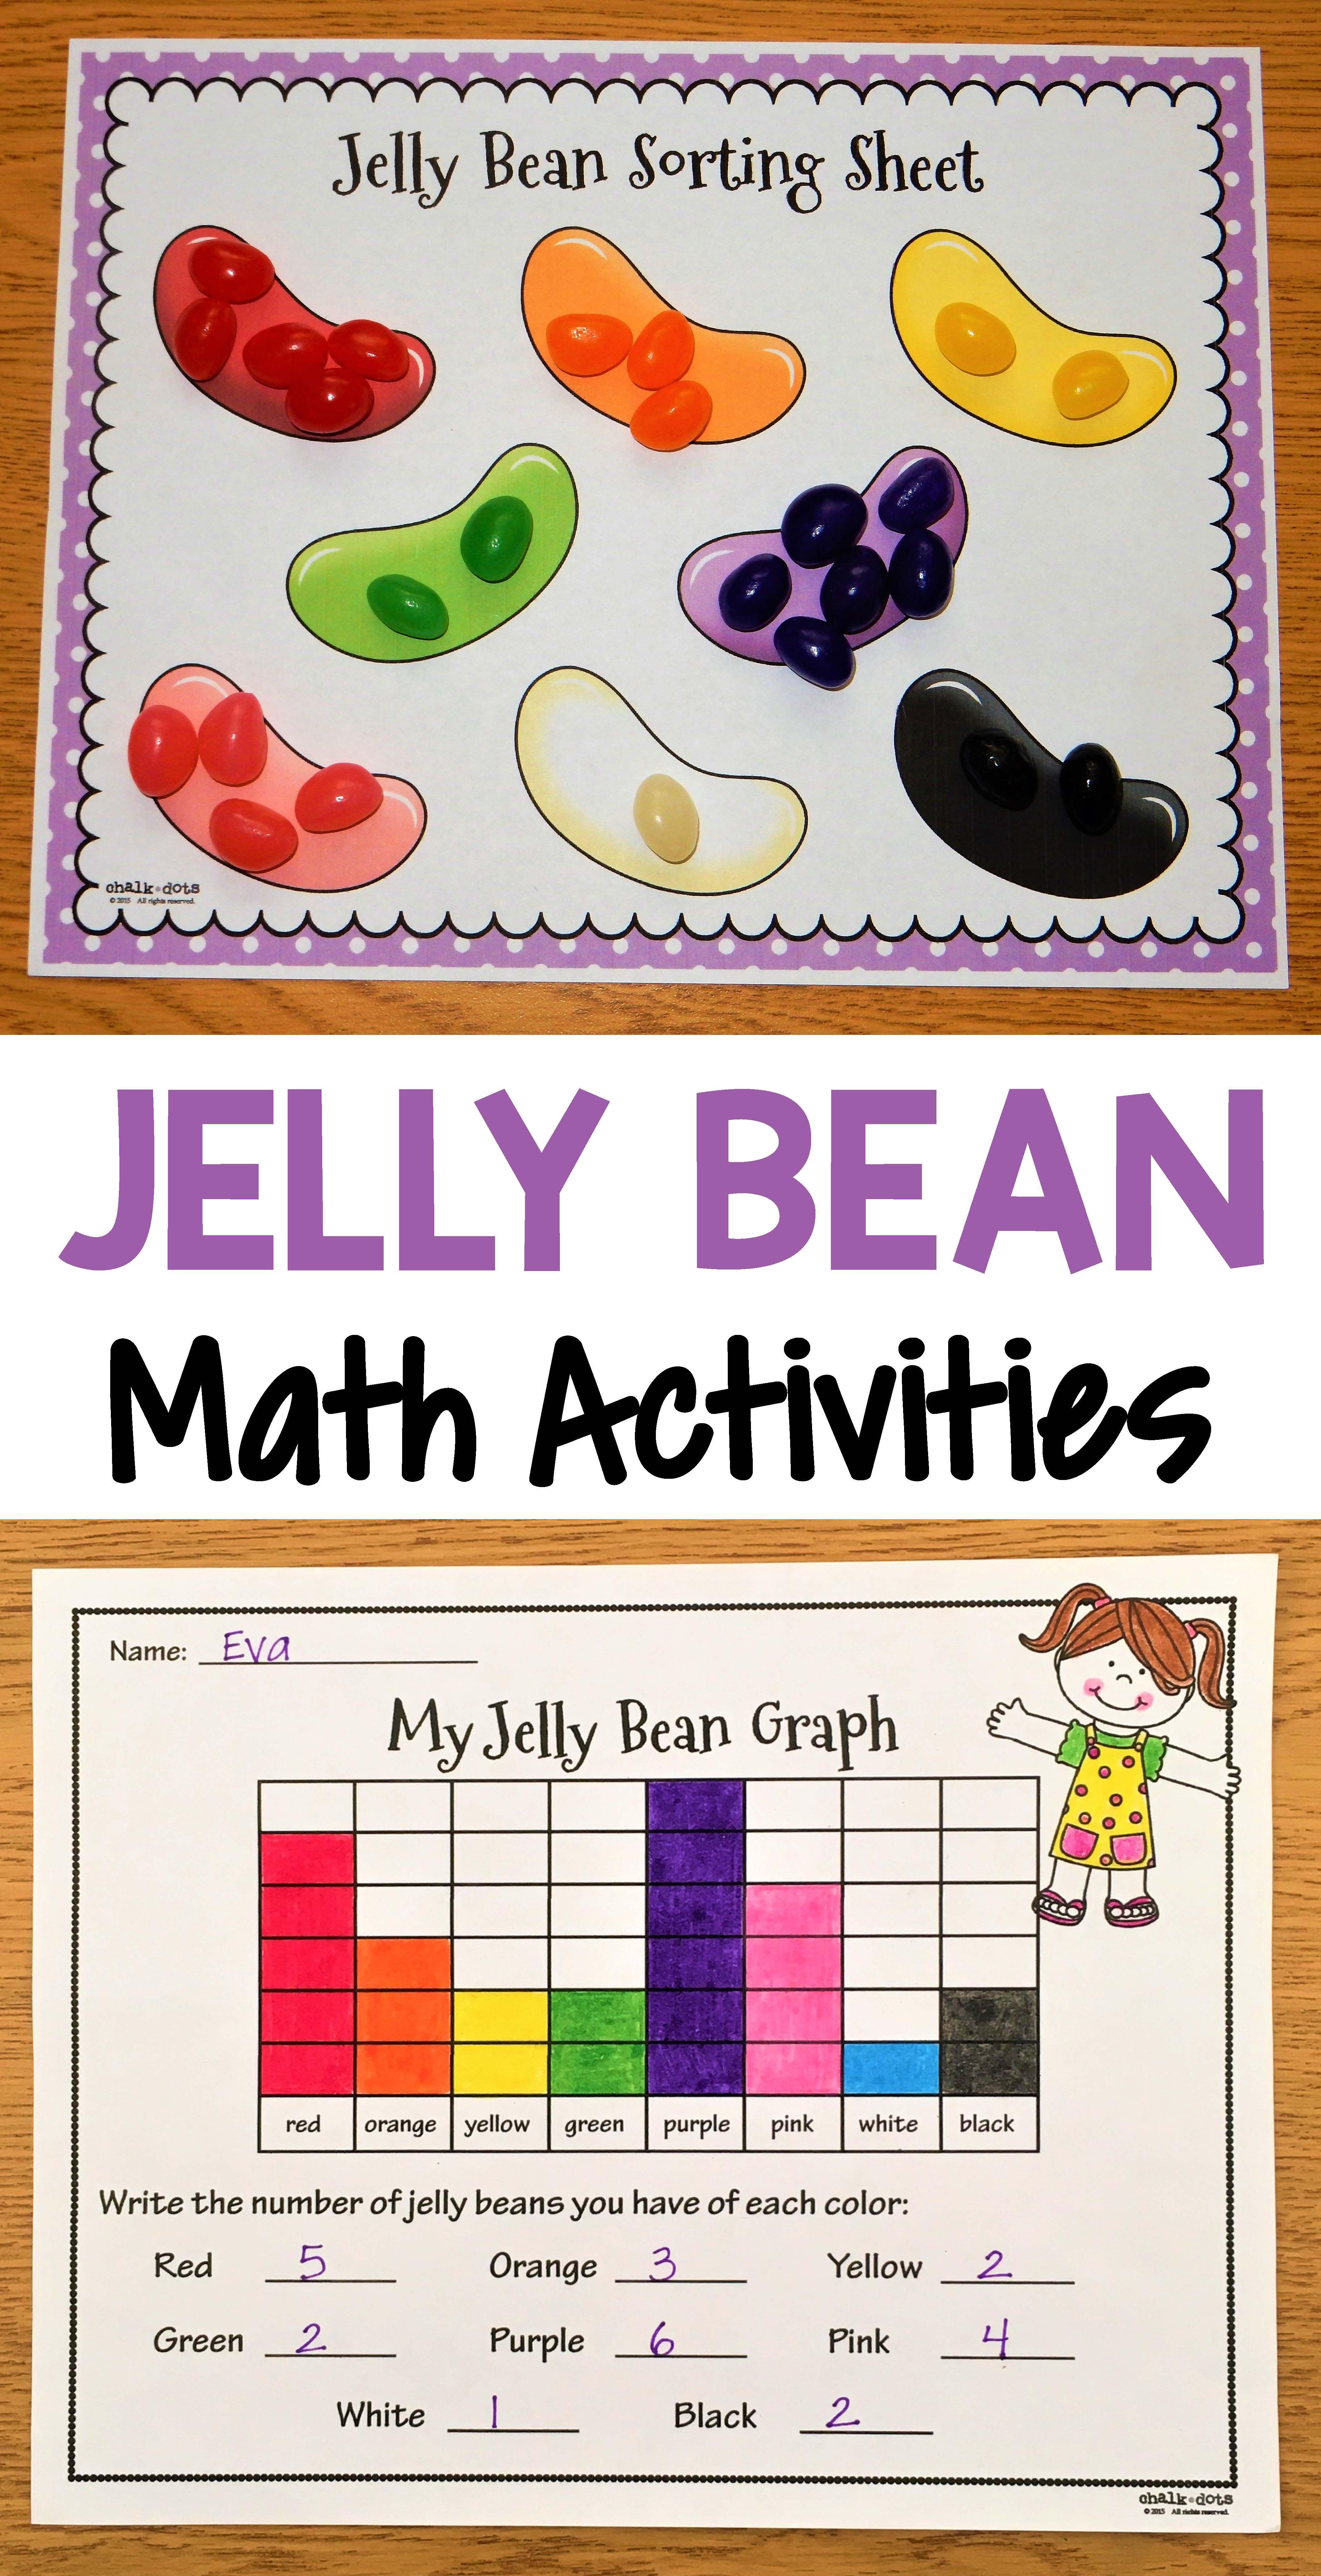 Jelly Bean Math Activities